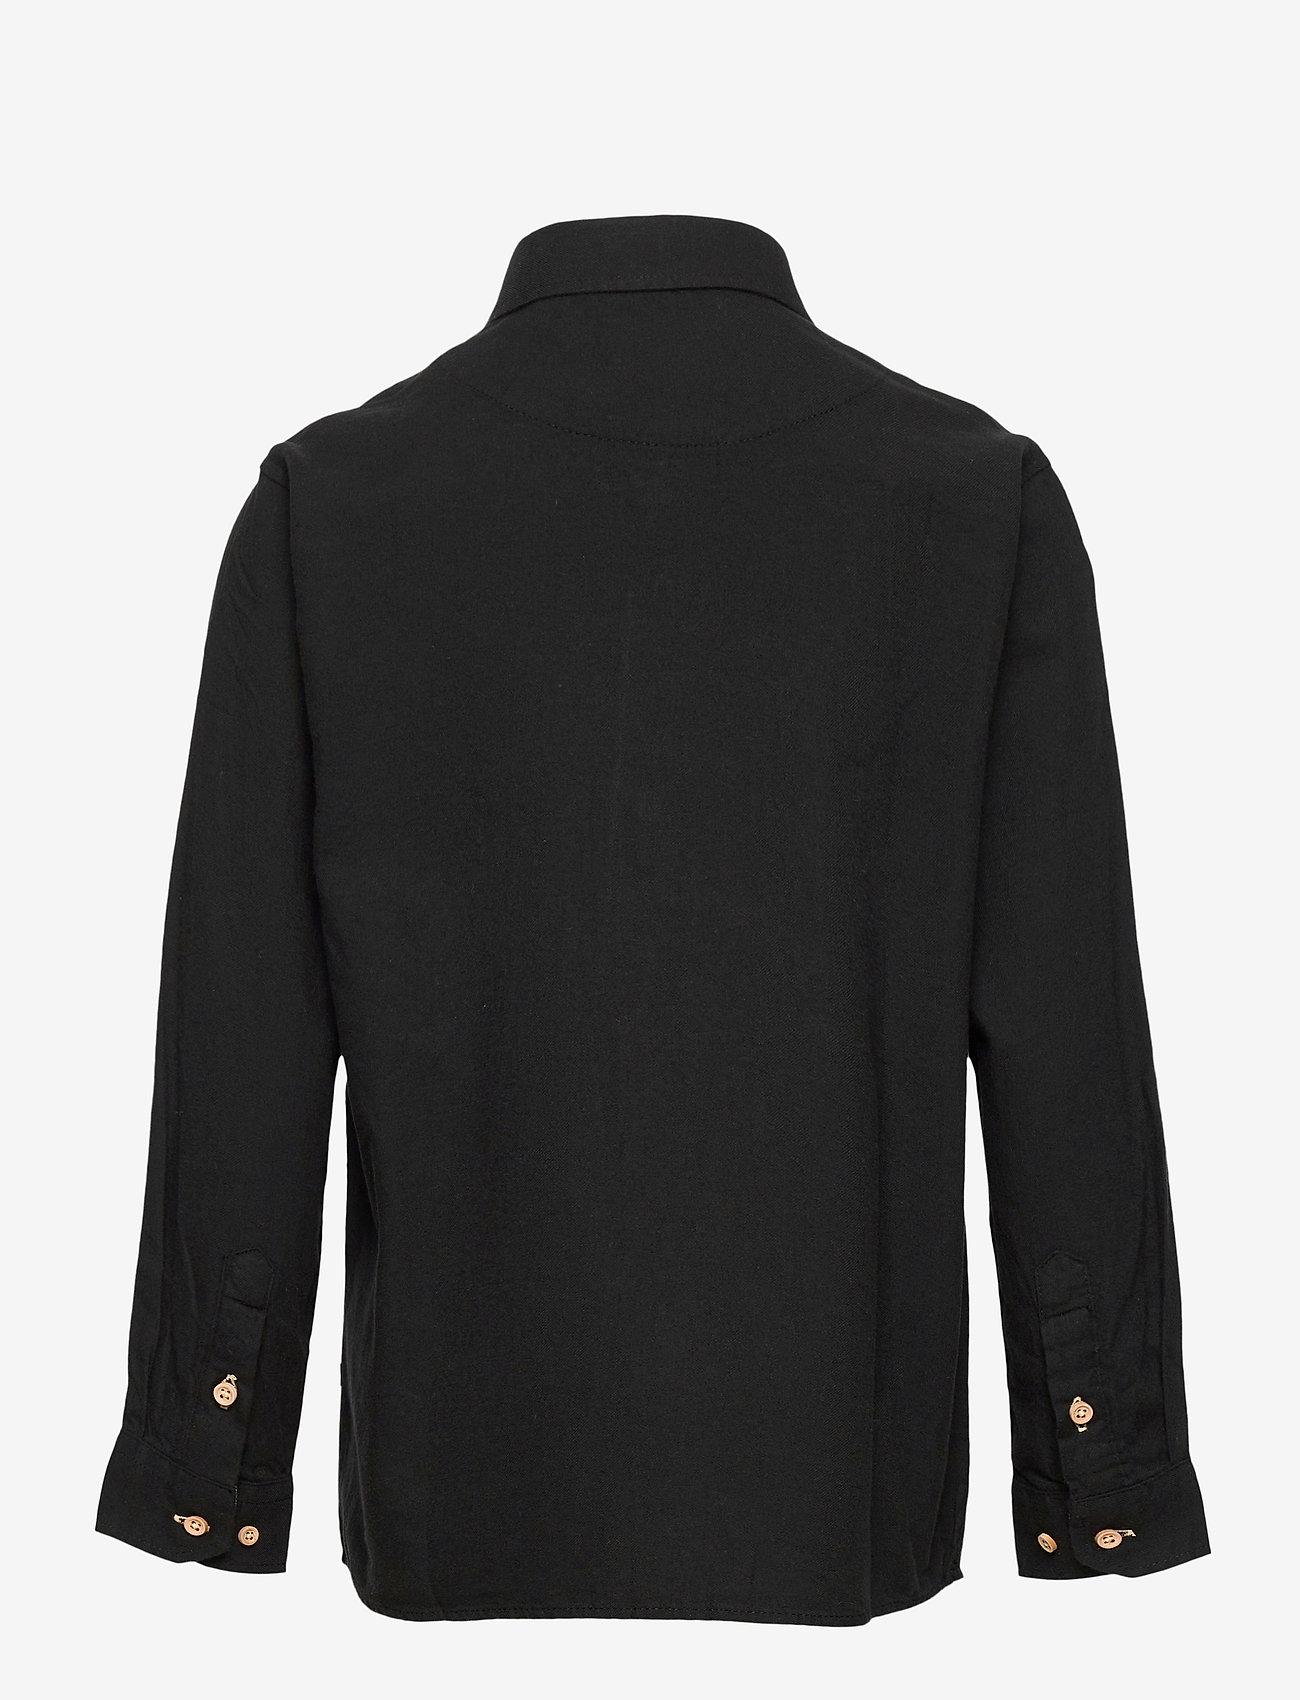 Kronstadt - Johan Diego - shirts - black - 1